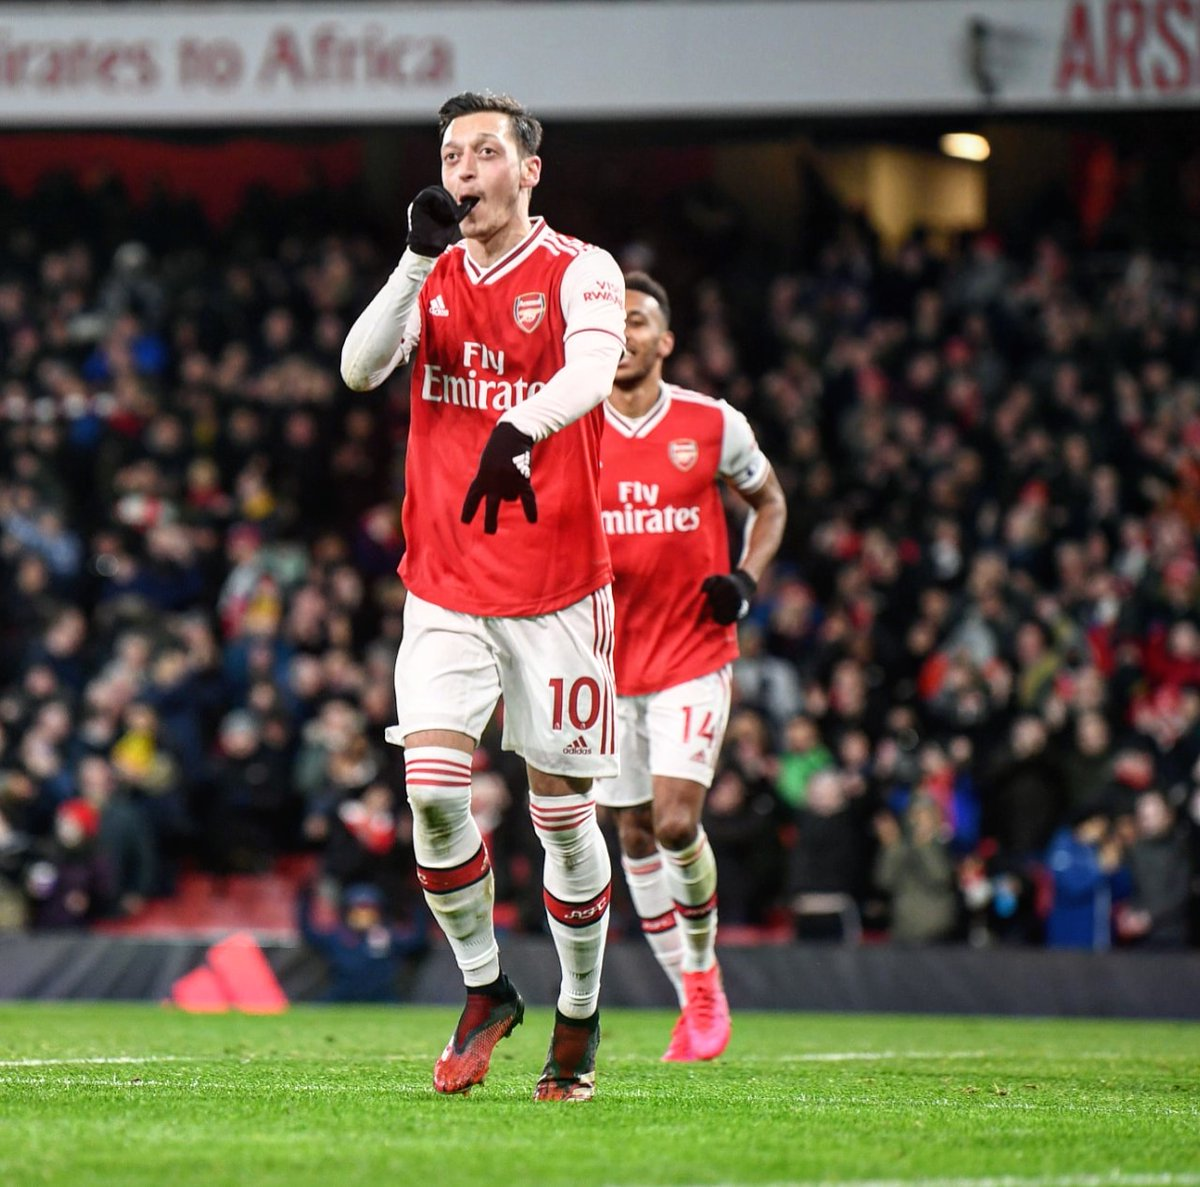 @MesutOzil1088's photo on Arsenal